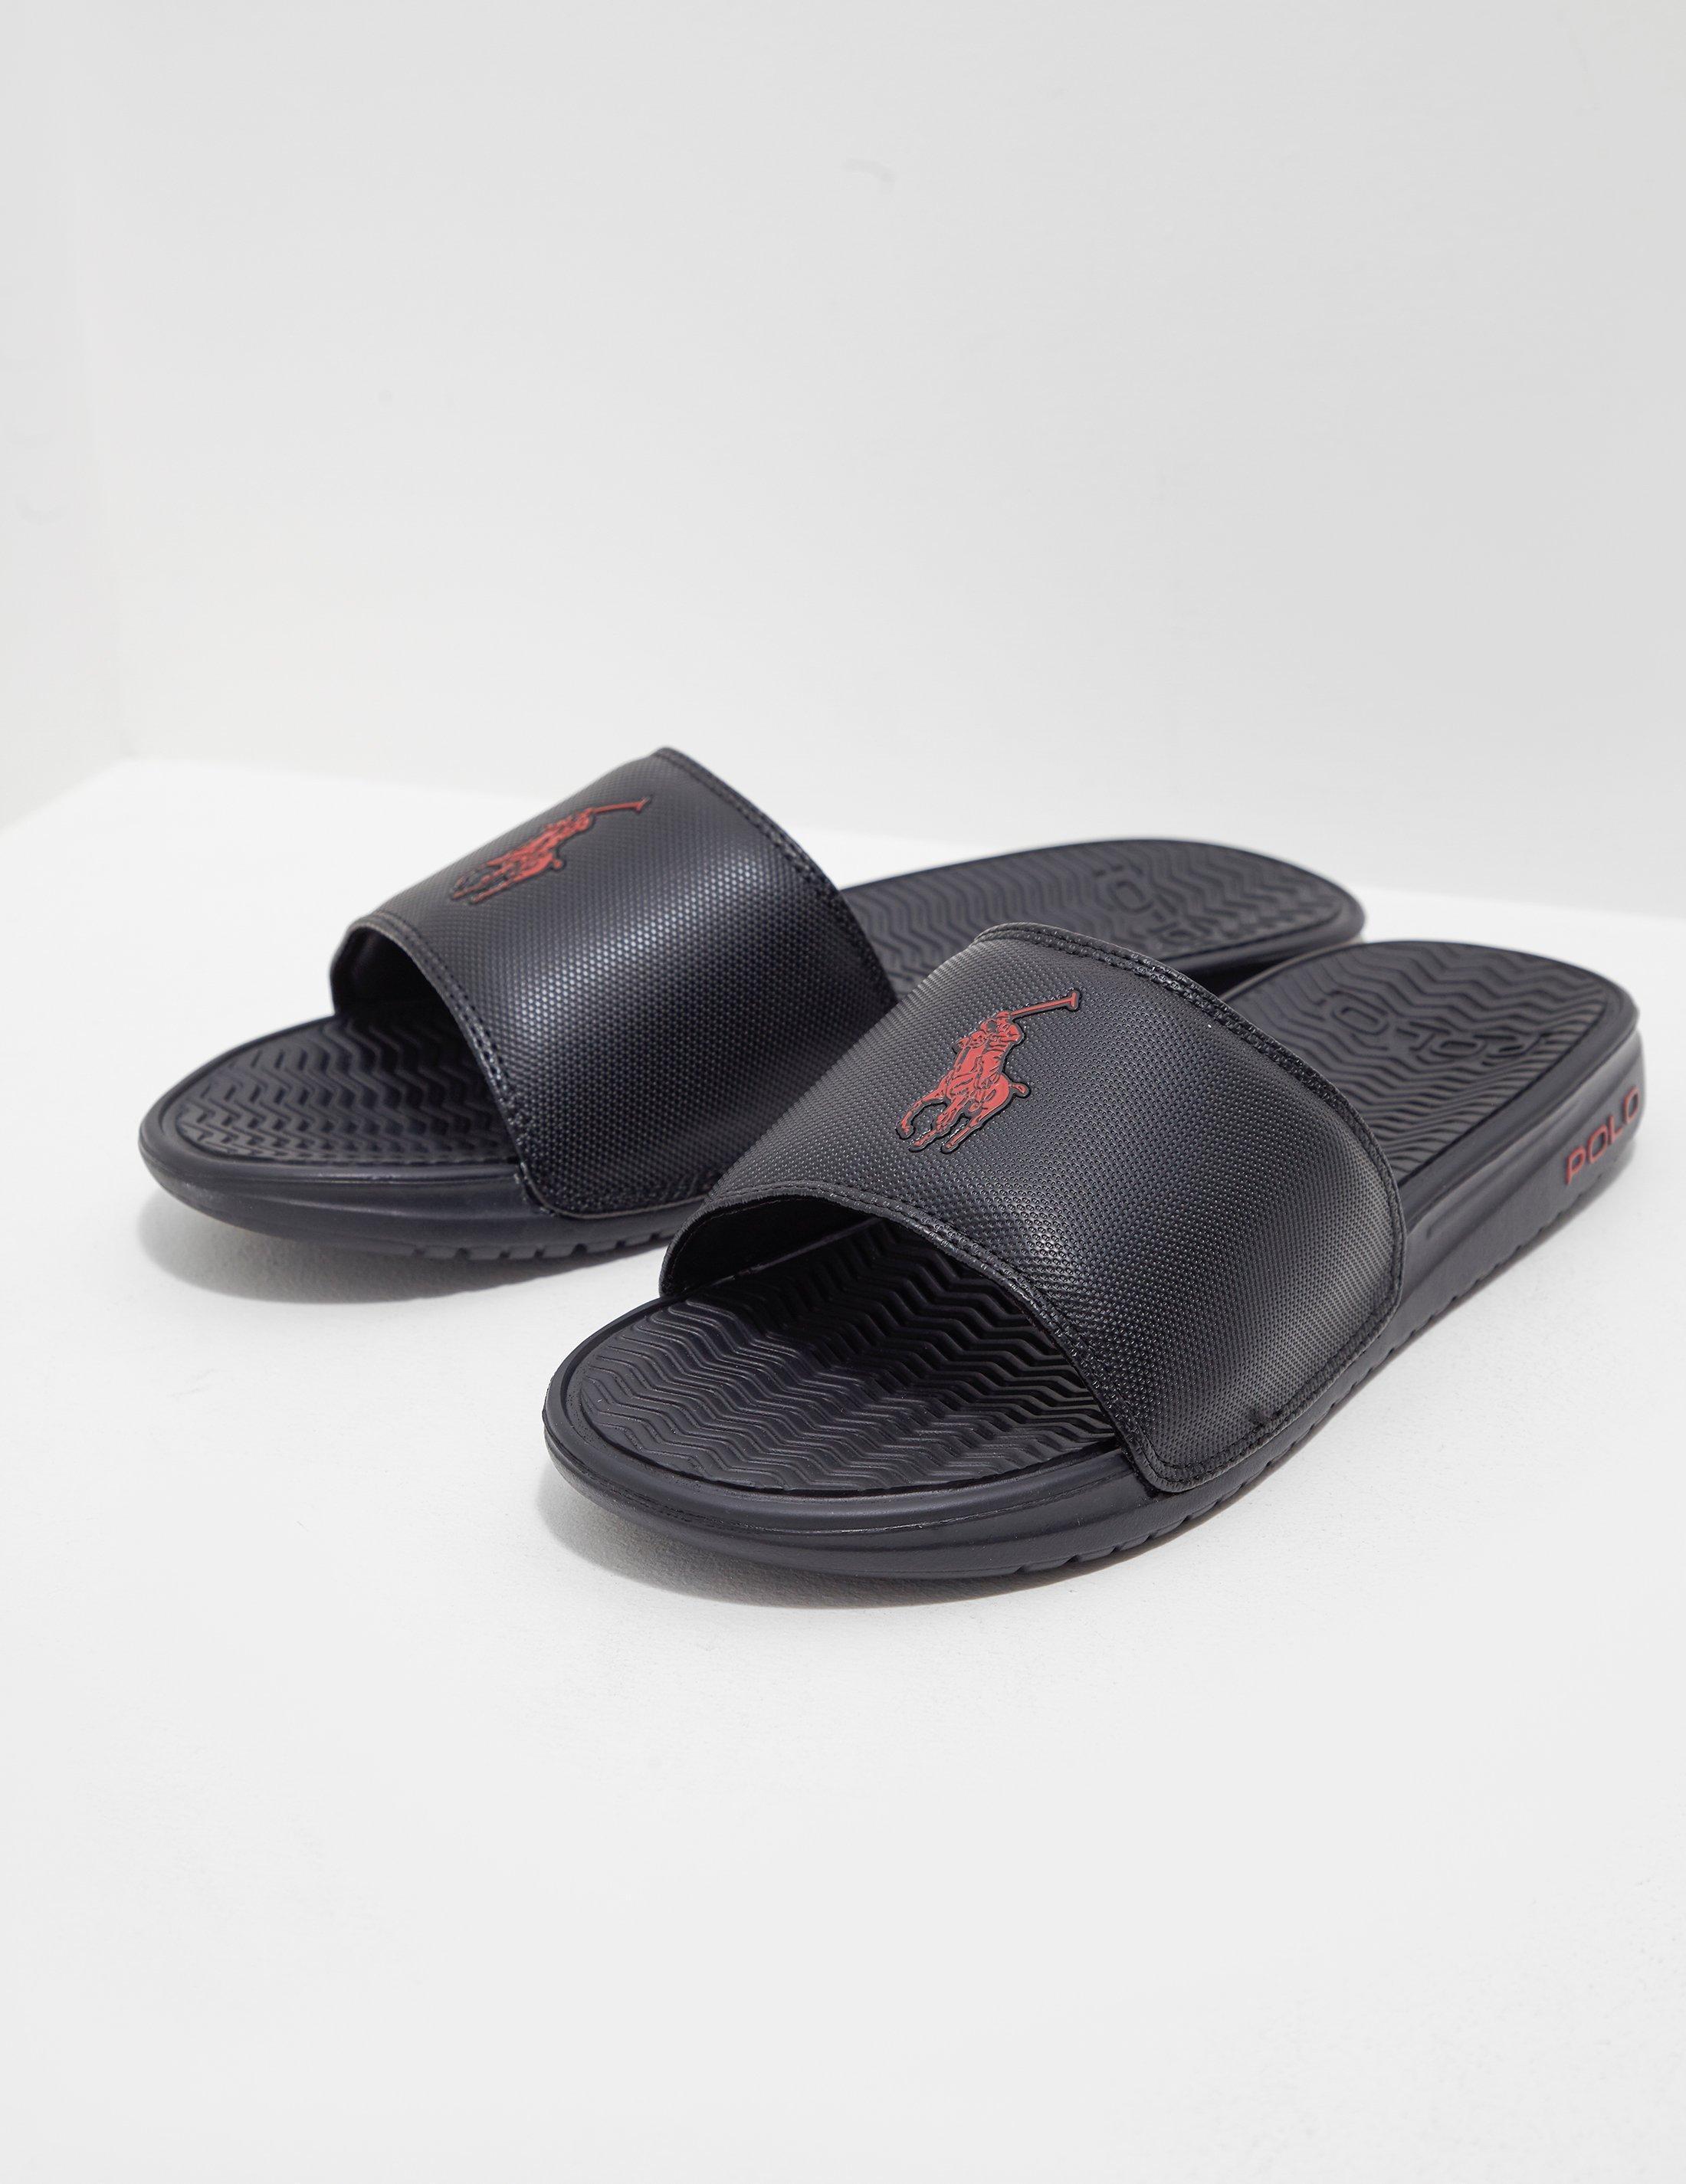 03bf5351cc89 Polo Ralph Lauren Rodwell Slide Sandal in Black for Men - Save 49 ...